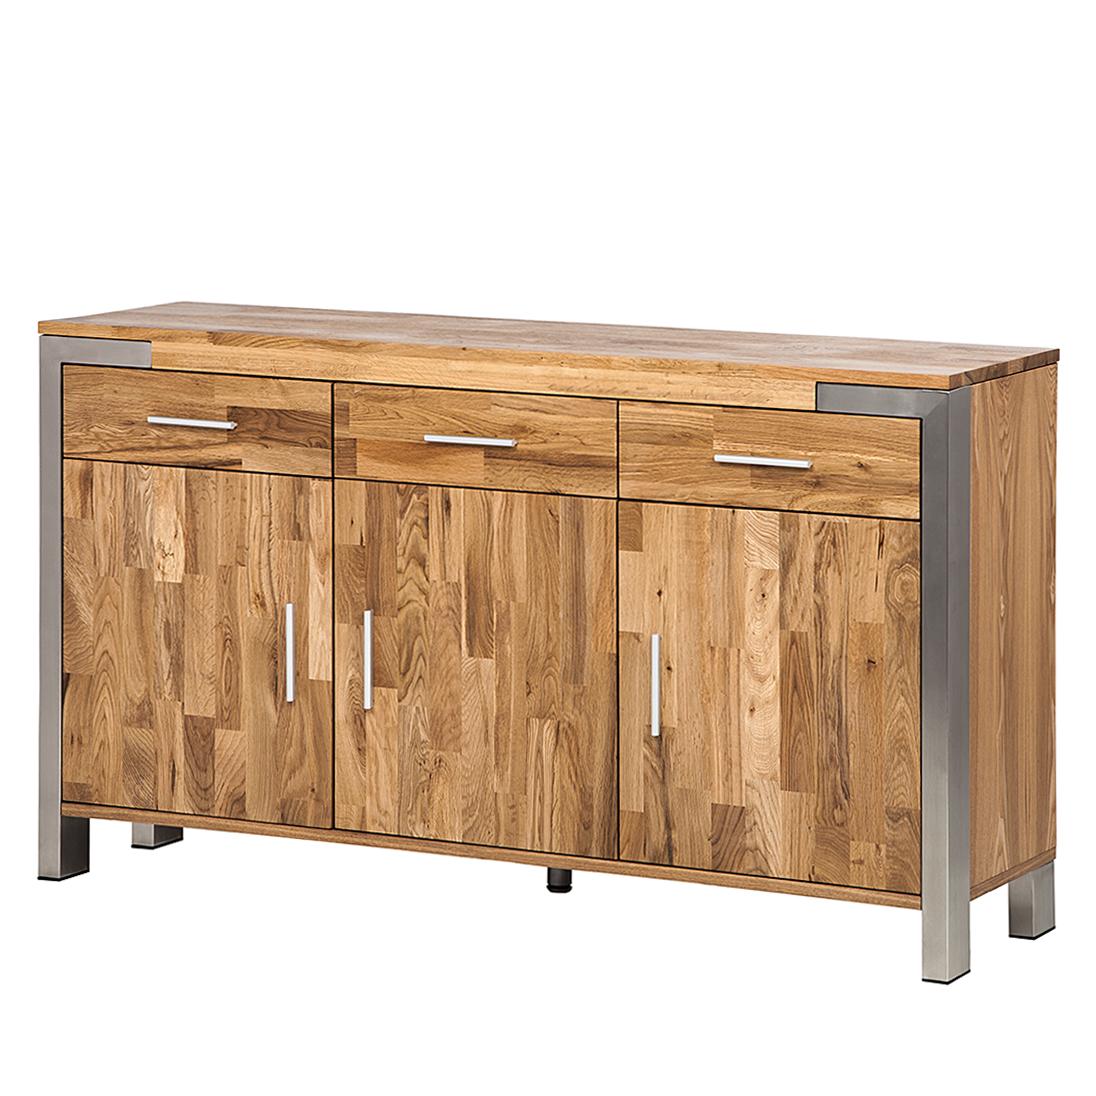 anrichte eiche massivholz edelstahl sideboard esszimmer buffet holz schrank neu ebay. Black Bedroom Furniture Sets. Home Design Ideas